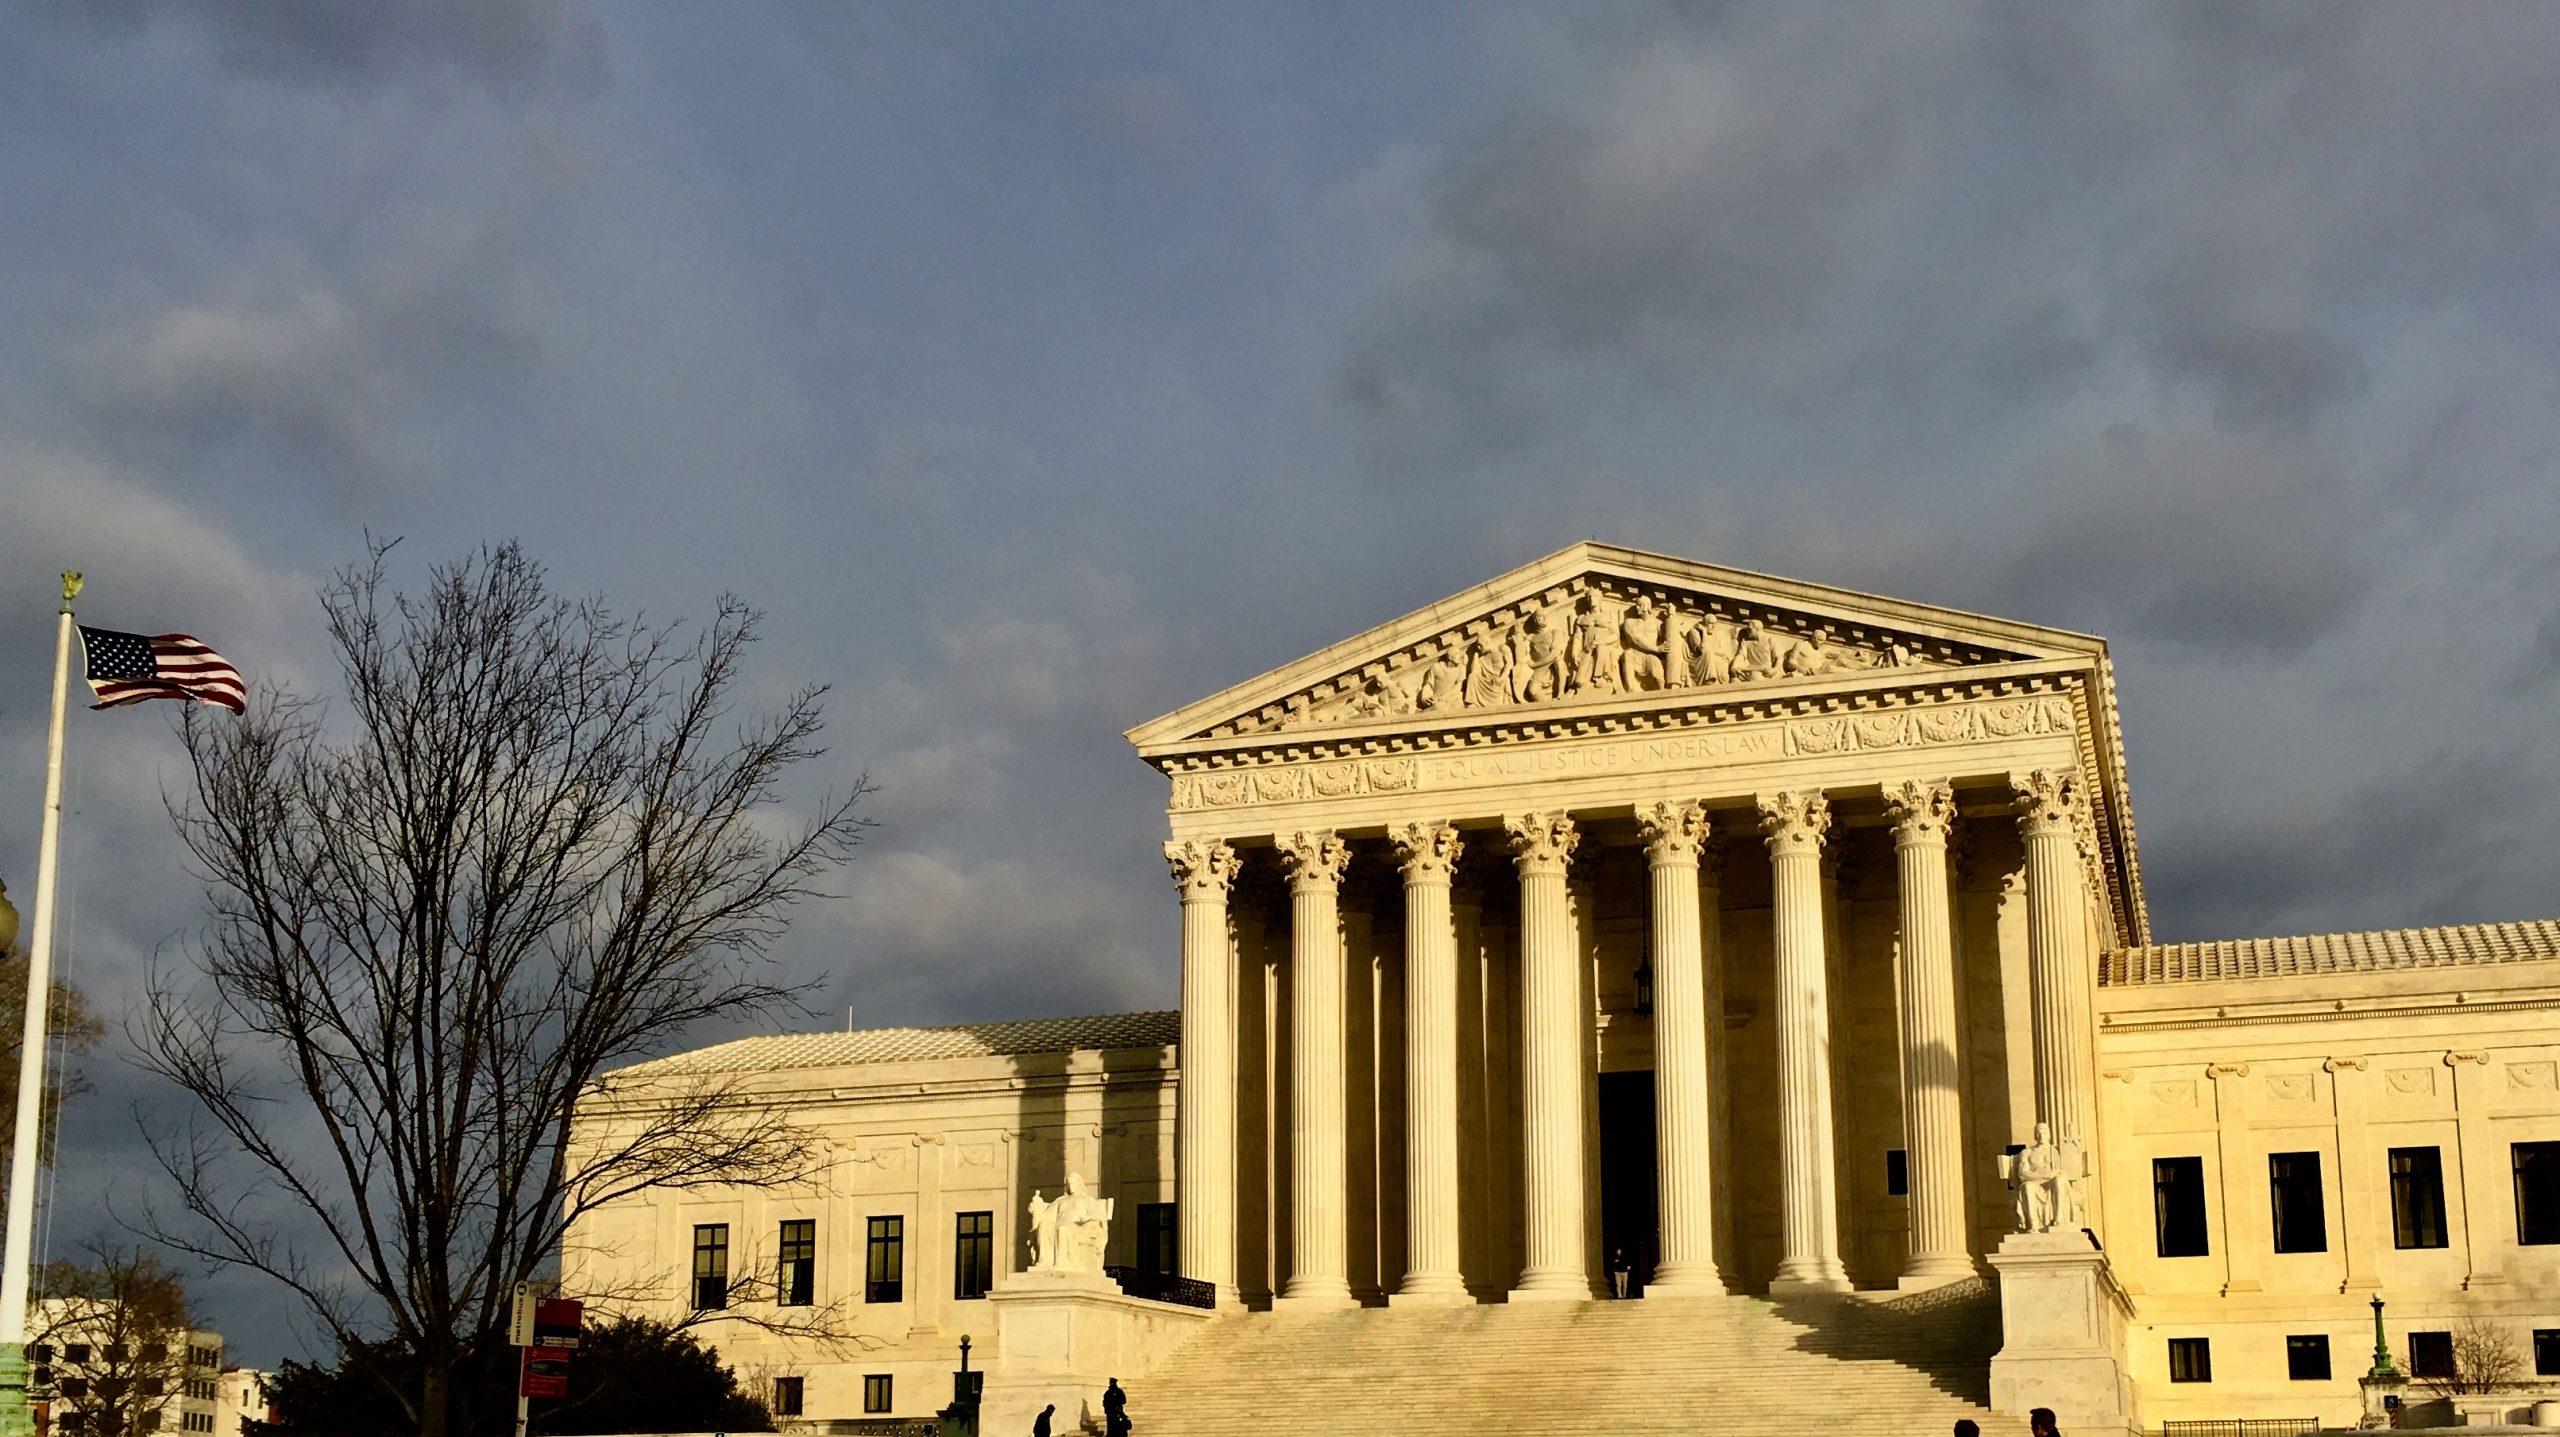 front facade of Supreme Court illuminated in winter sun